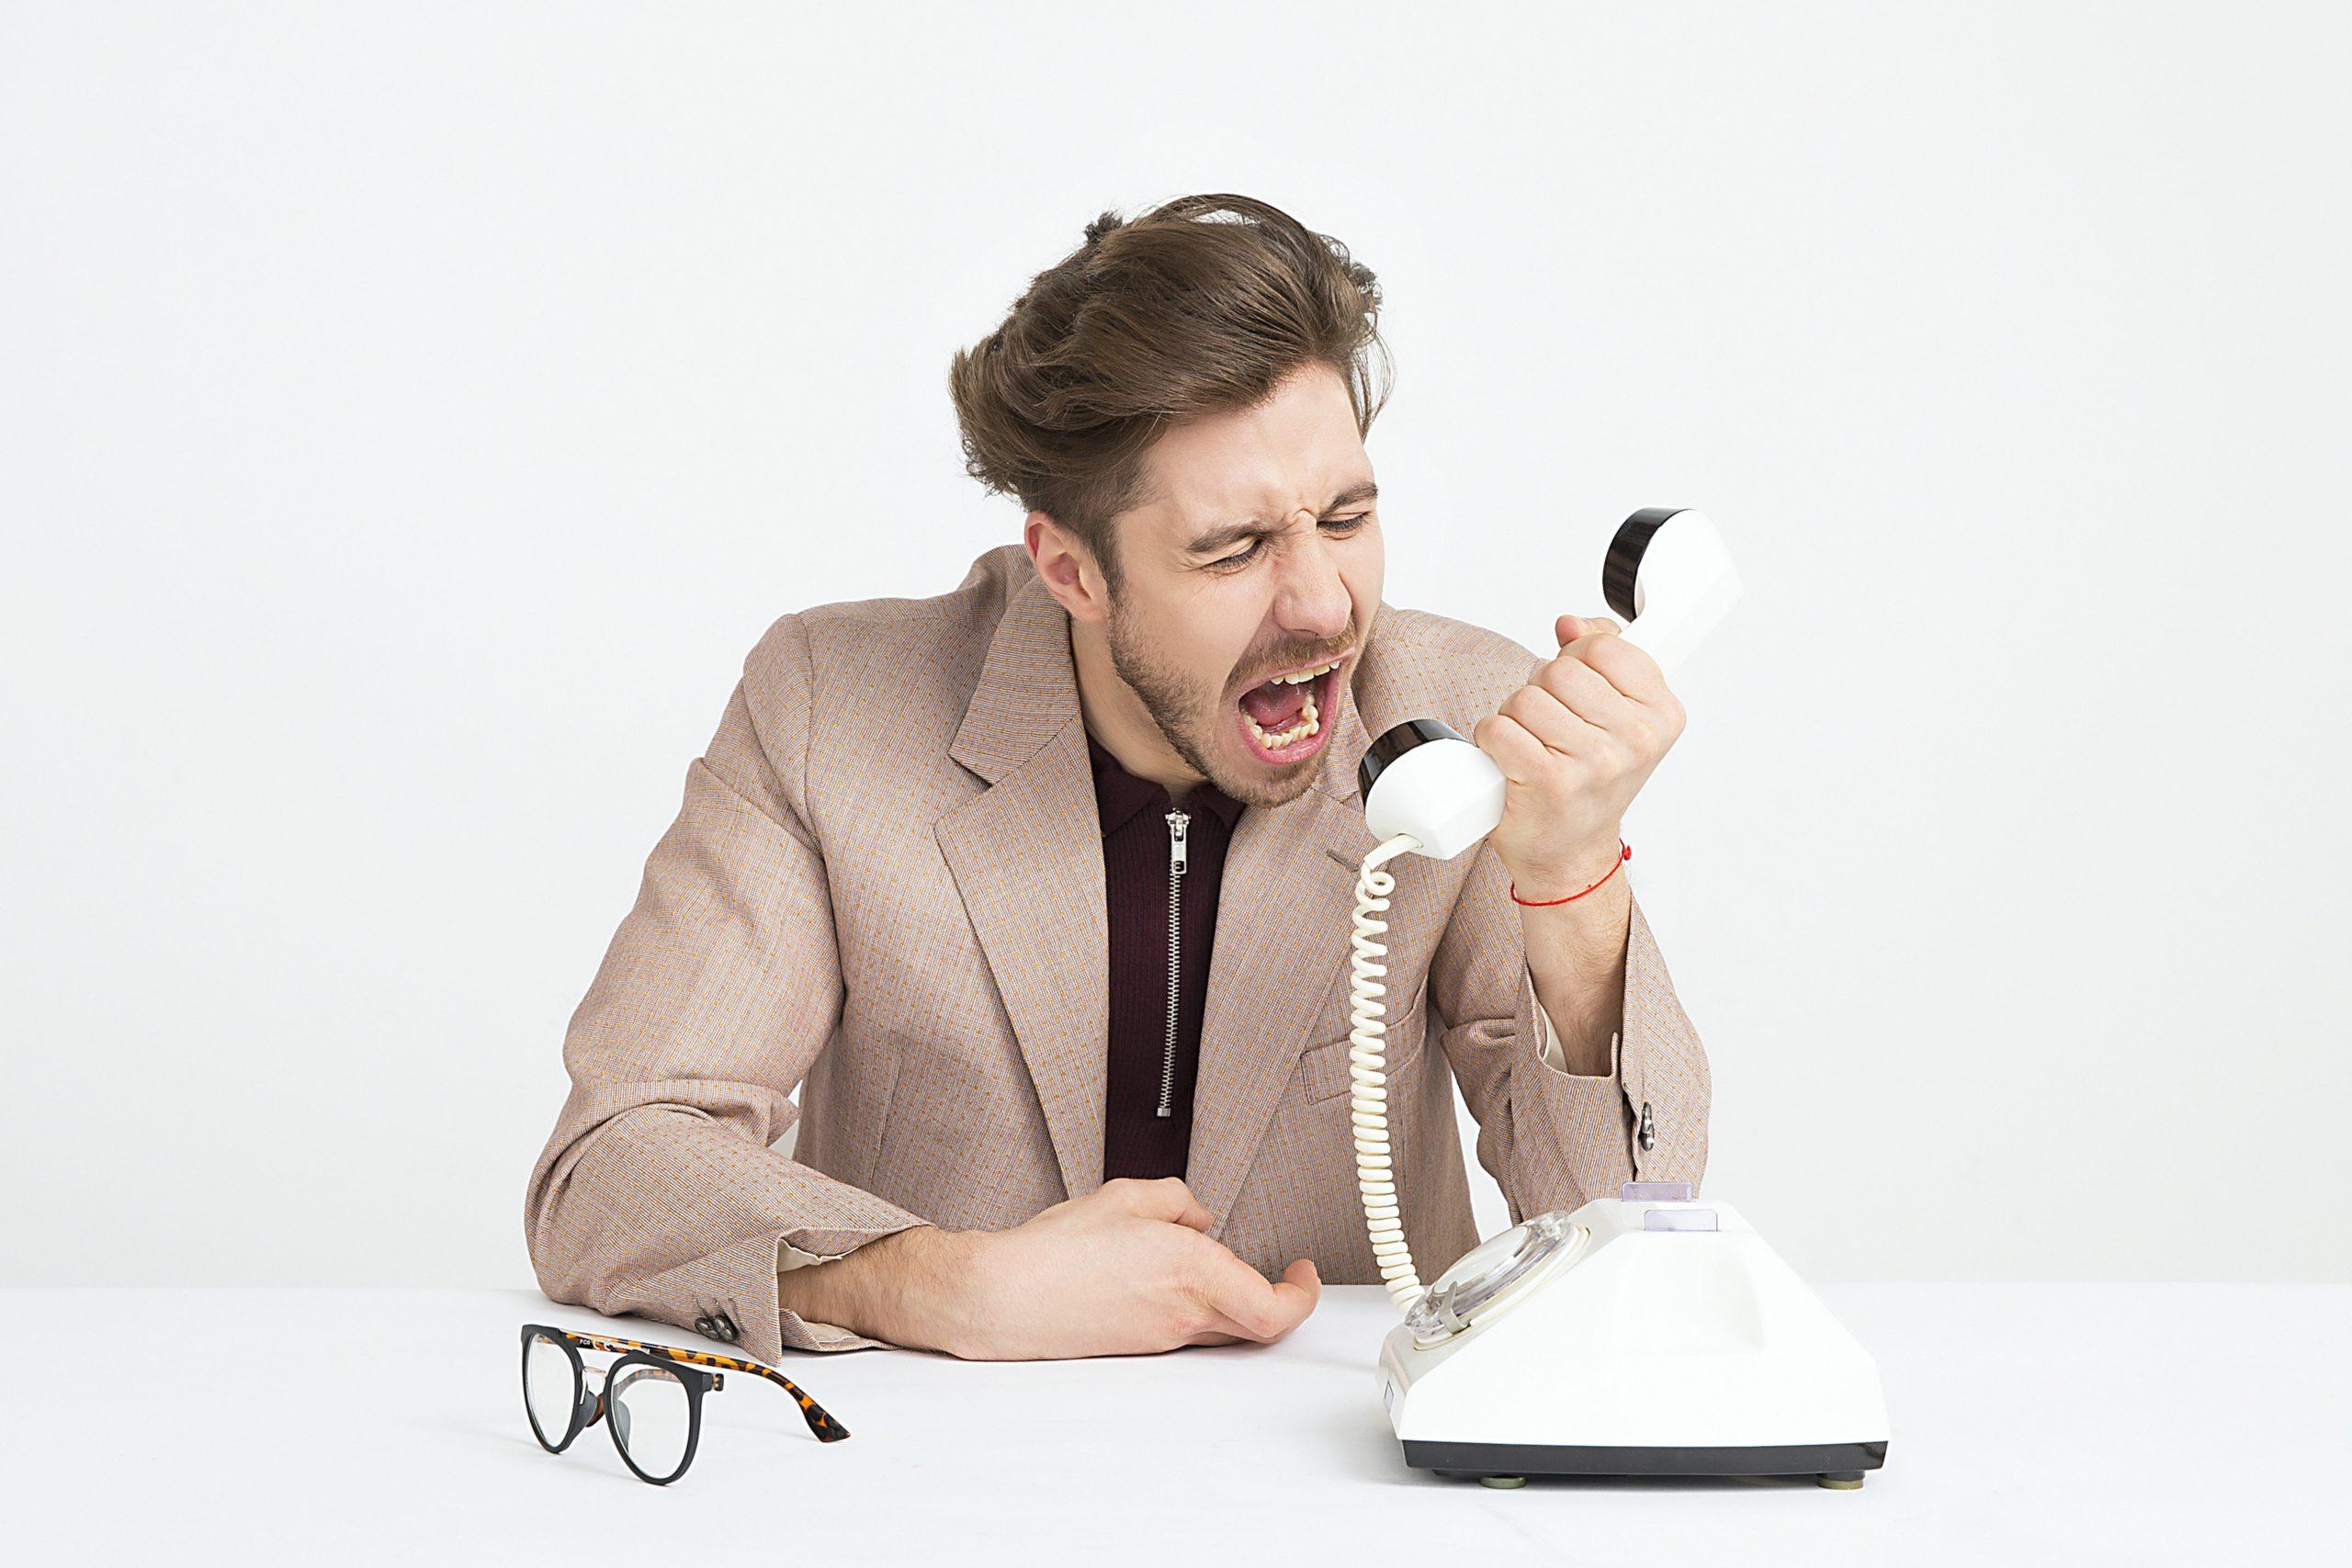 man holding telephone screaming telefon festnetz head